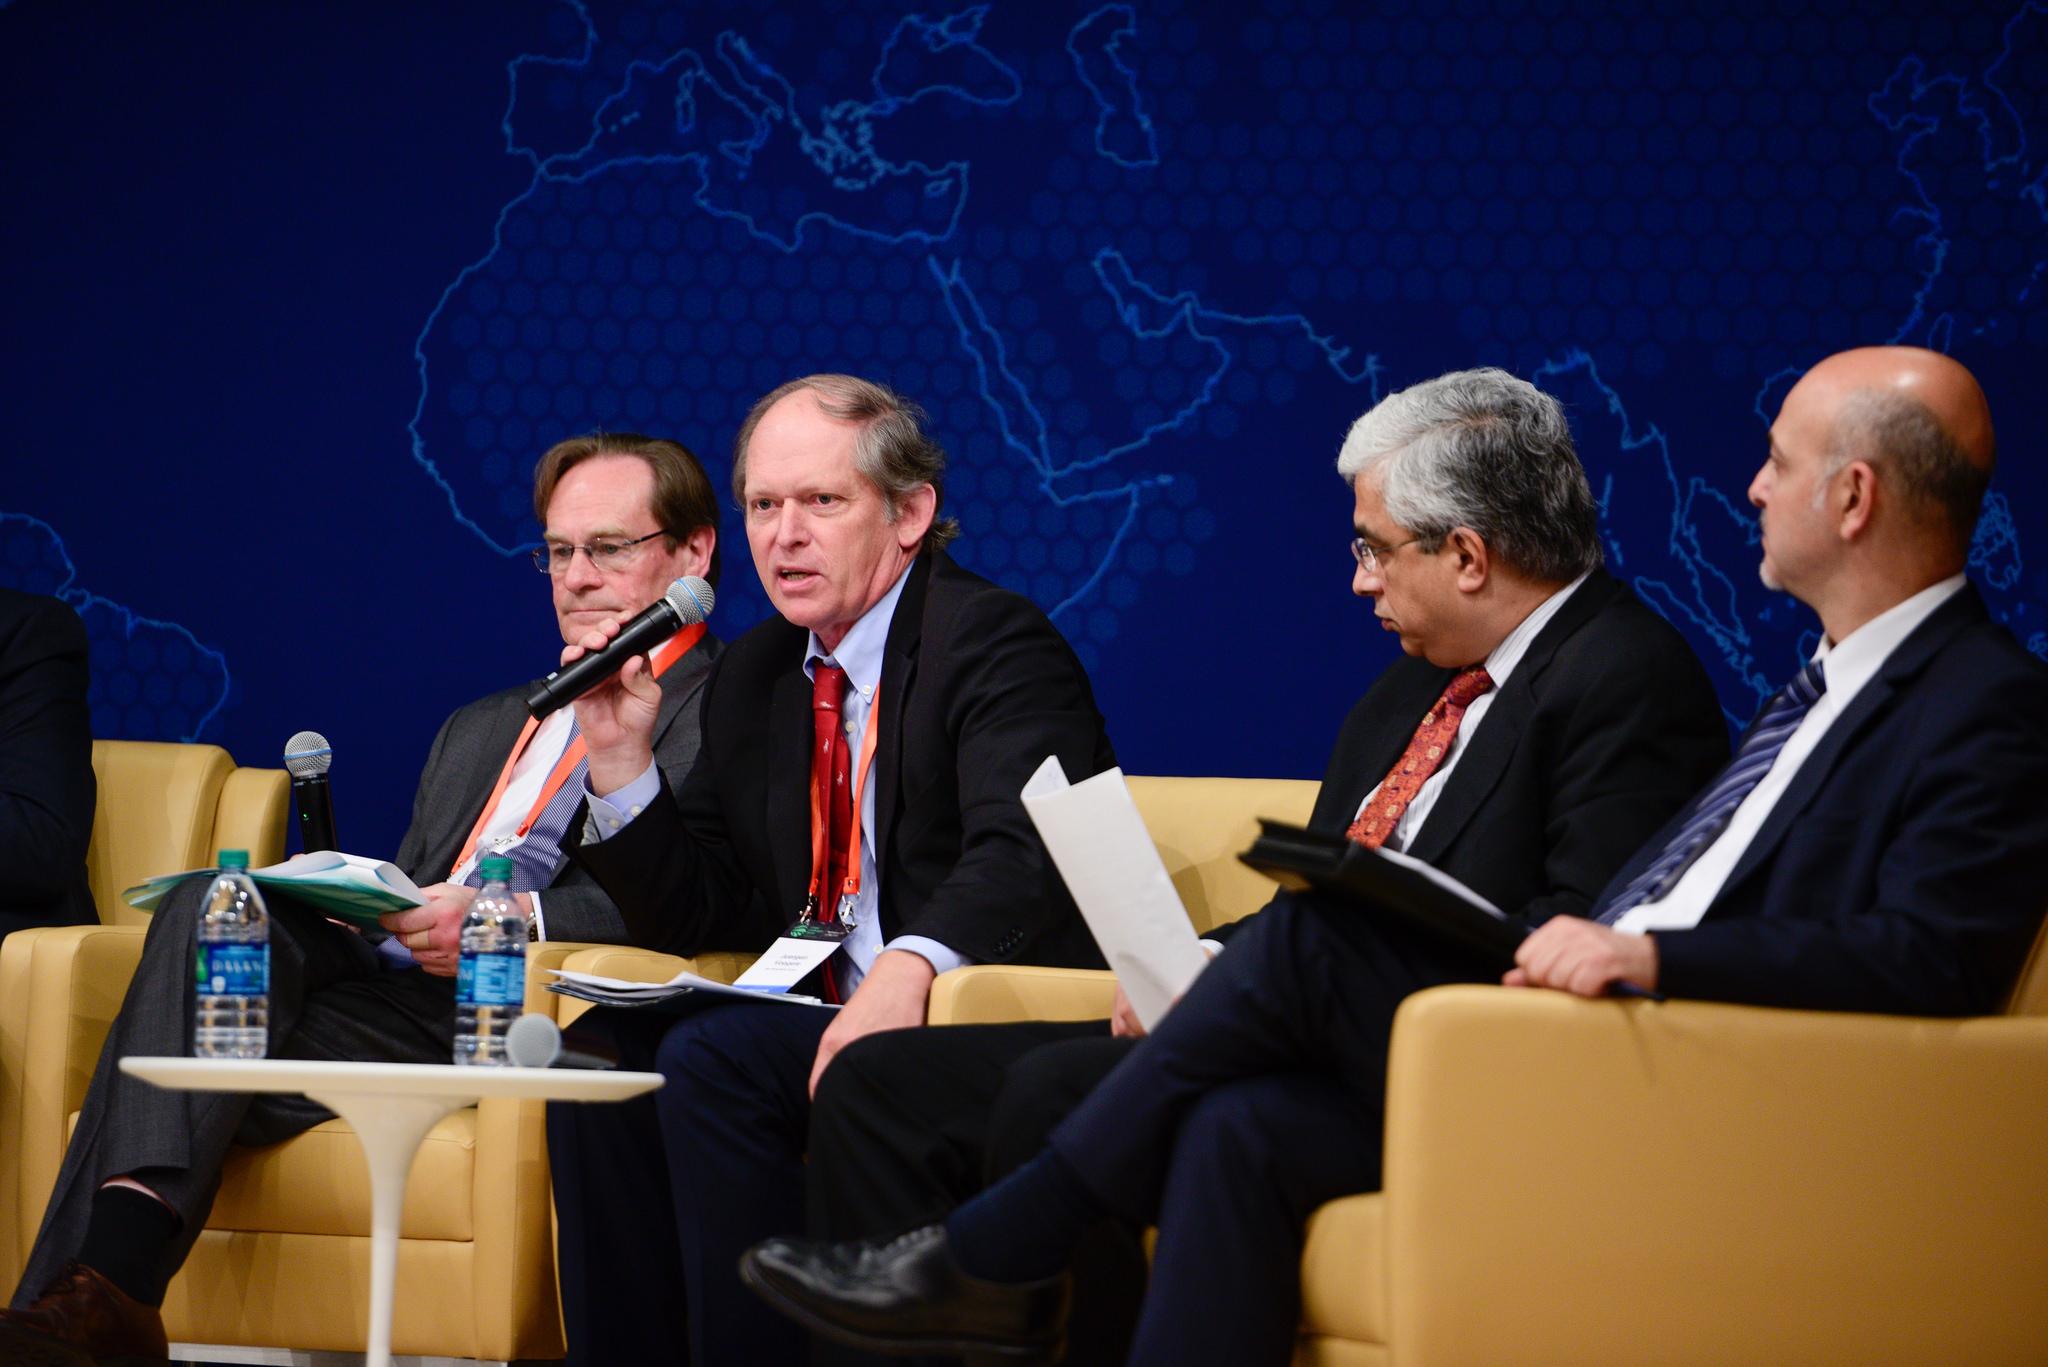 GLF Investment Case Symposium Washington, D.C. 2018